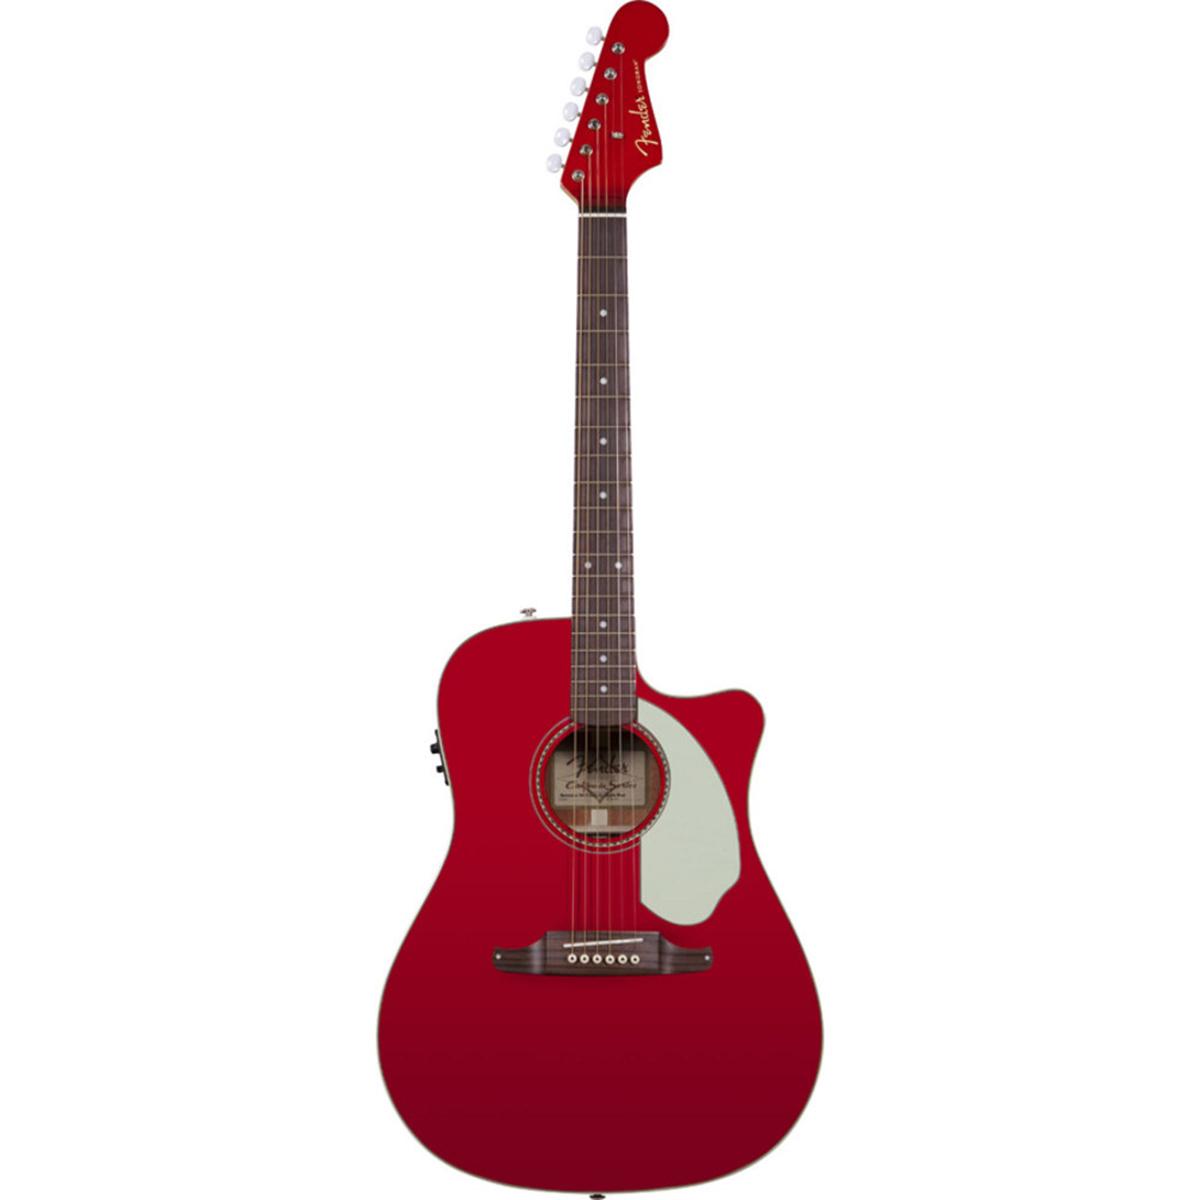 Fender - Sonoran SCE Candy Apple RedV2 California